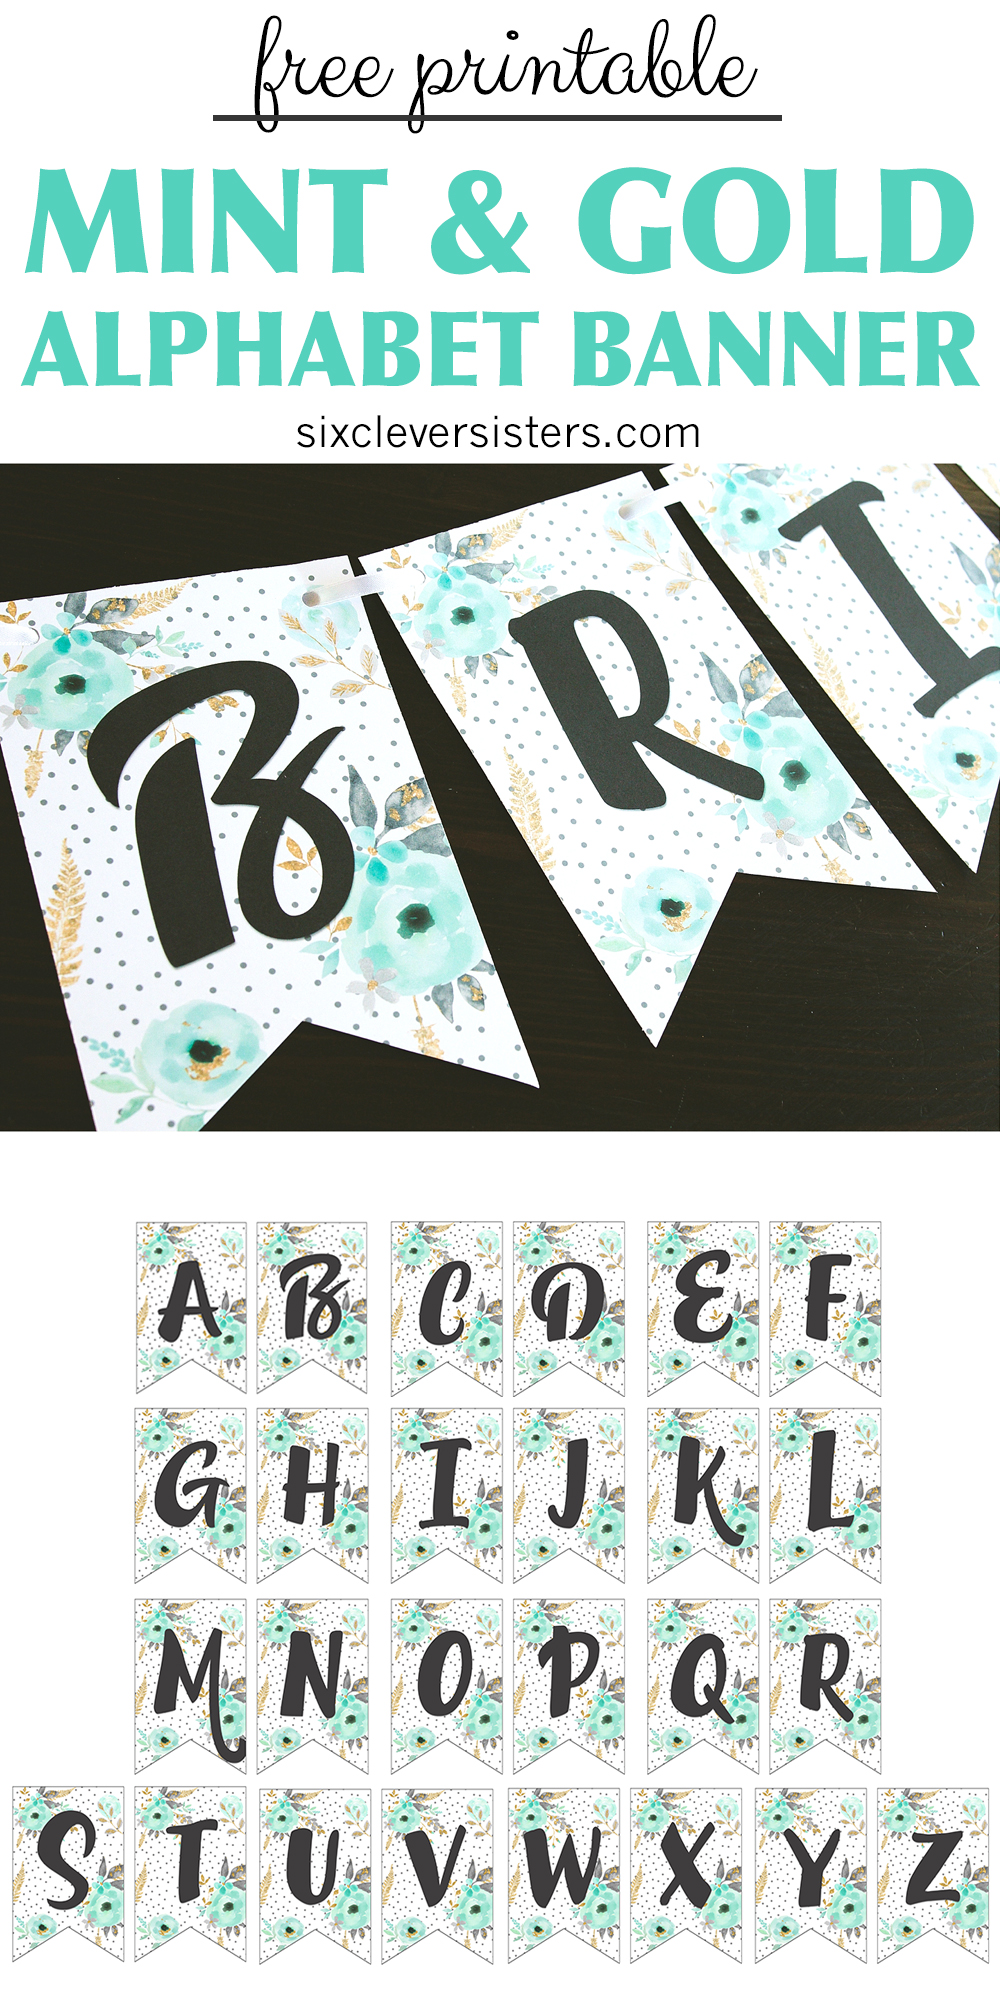 photograph regarding Free Printable Alphabet Banner named No cost Printable Alphabet Banner MINT GOLD - 6 Good Sisters